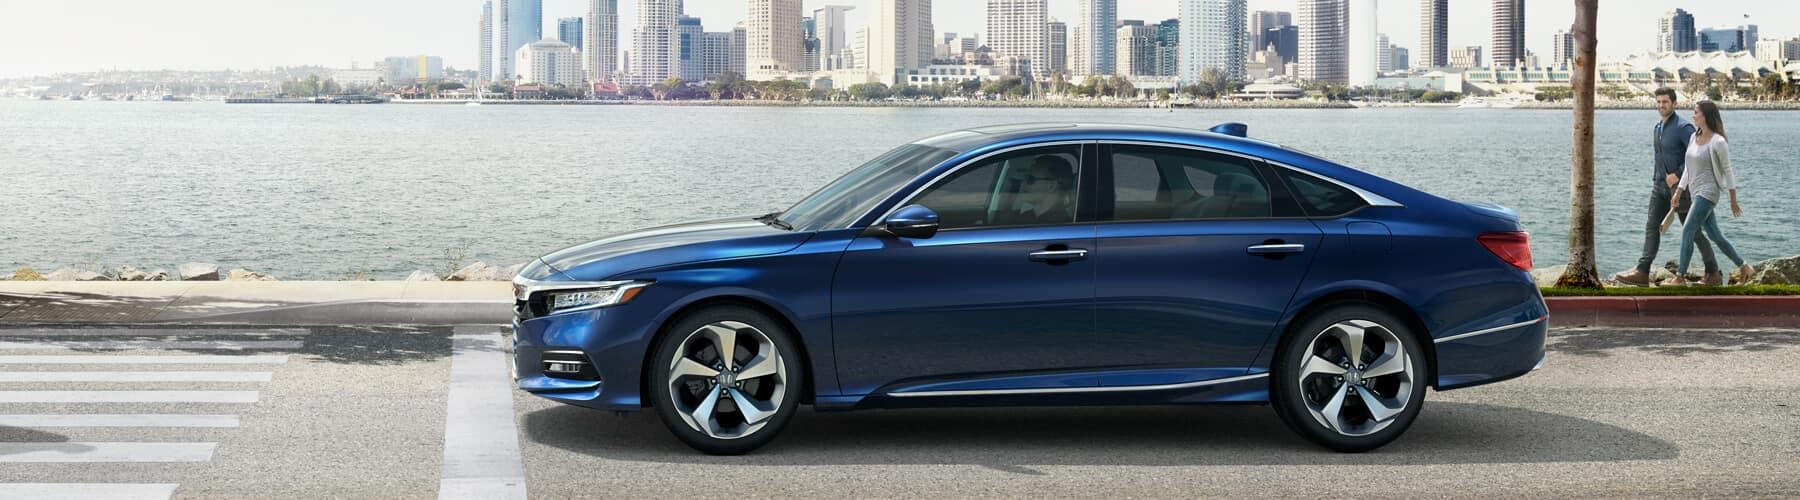 2019 Honda Accord Sedan Banner